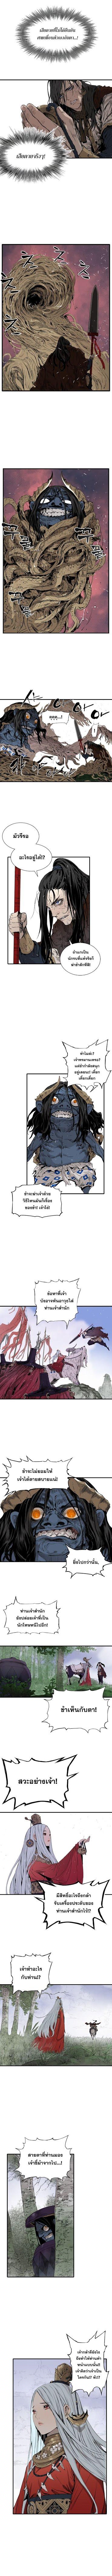 Sword Sheath's Child - หน้า 3